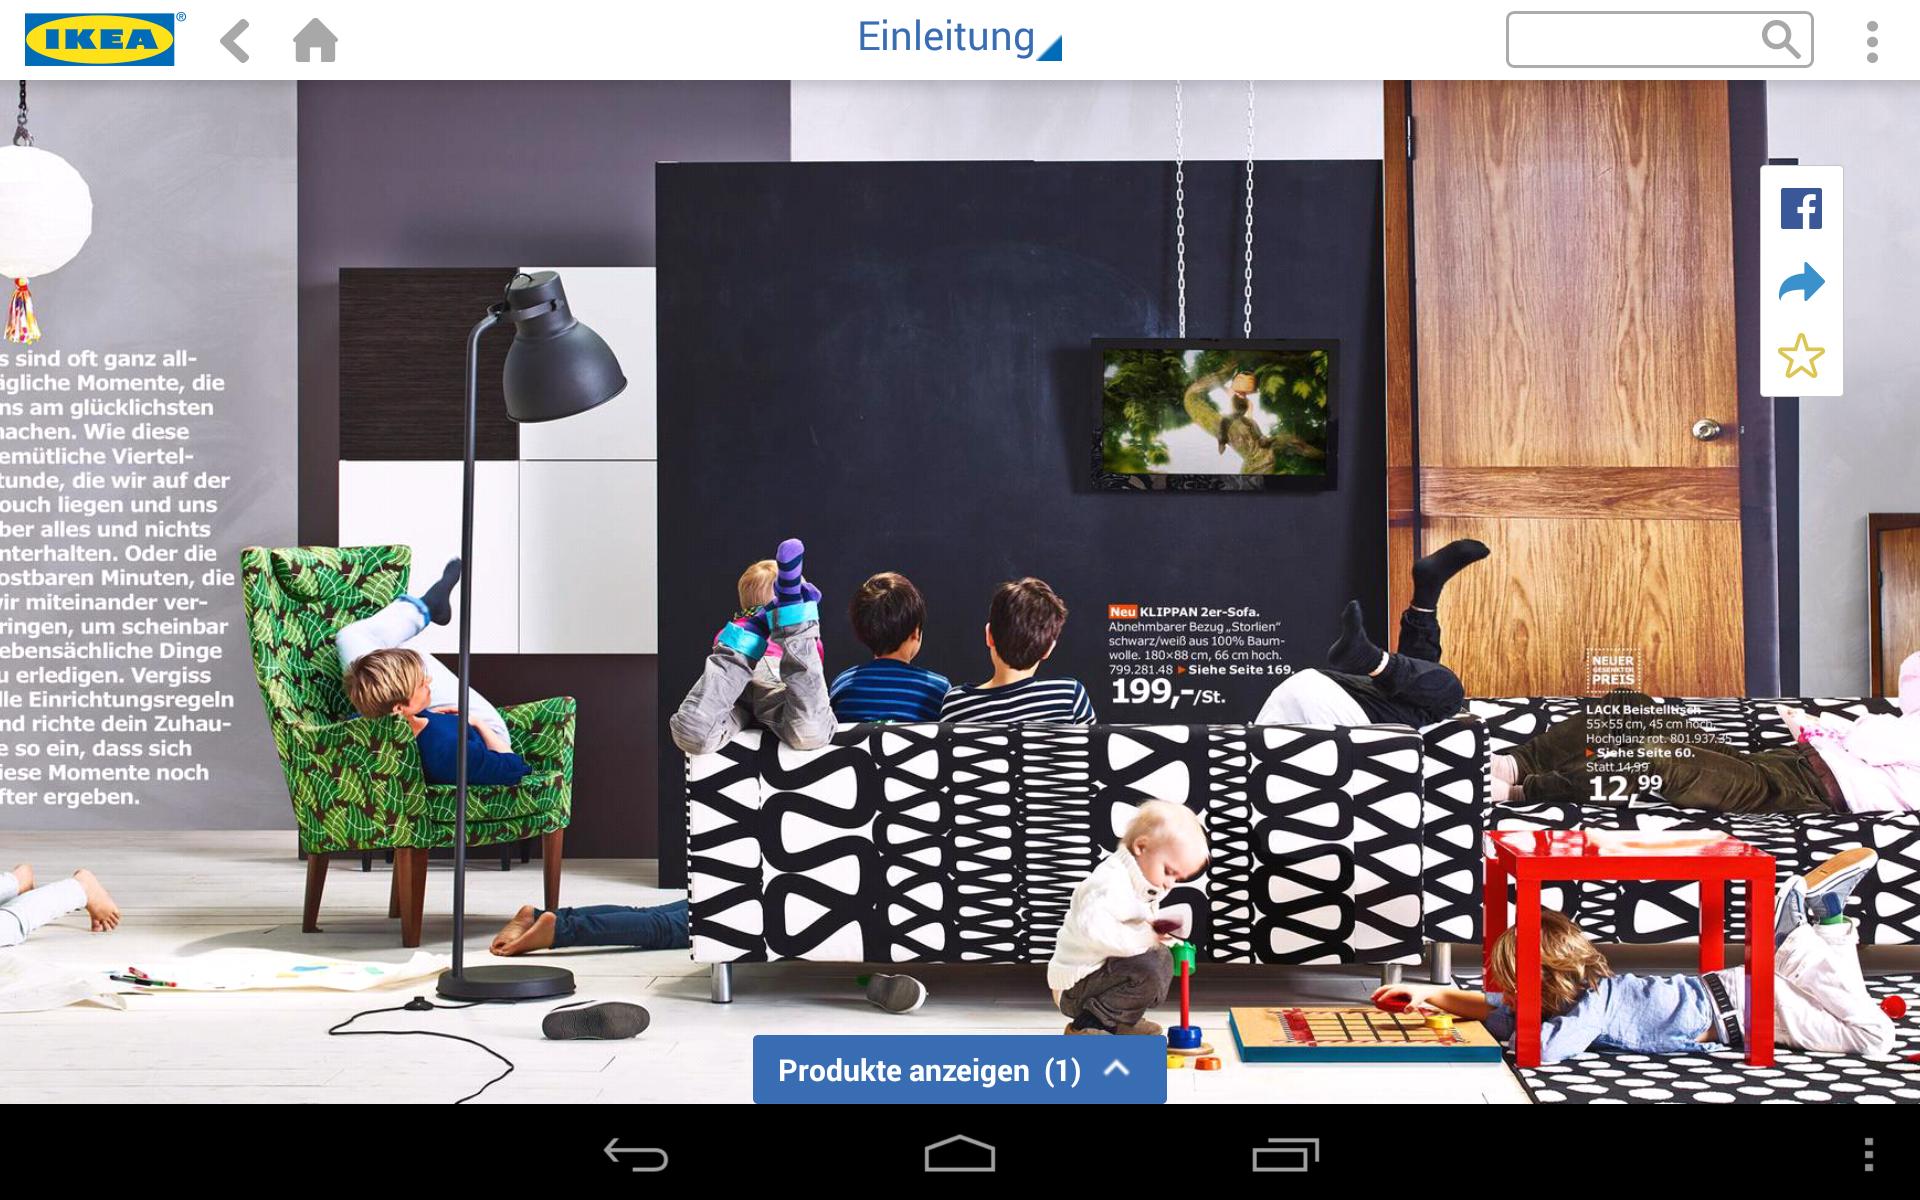 Ikea katalog empfehlung der redaktion for Raumgestaltung 360 grad